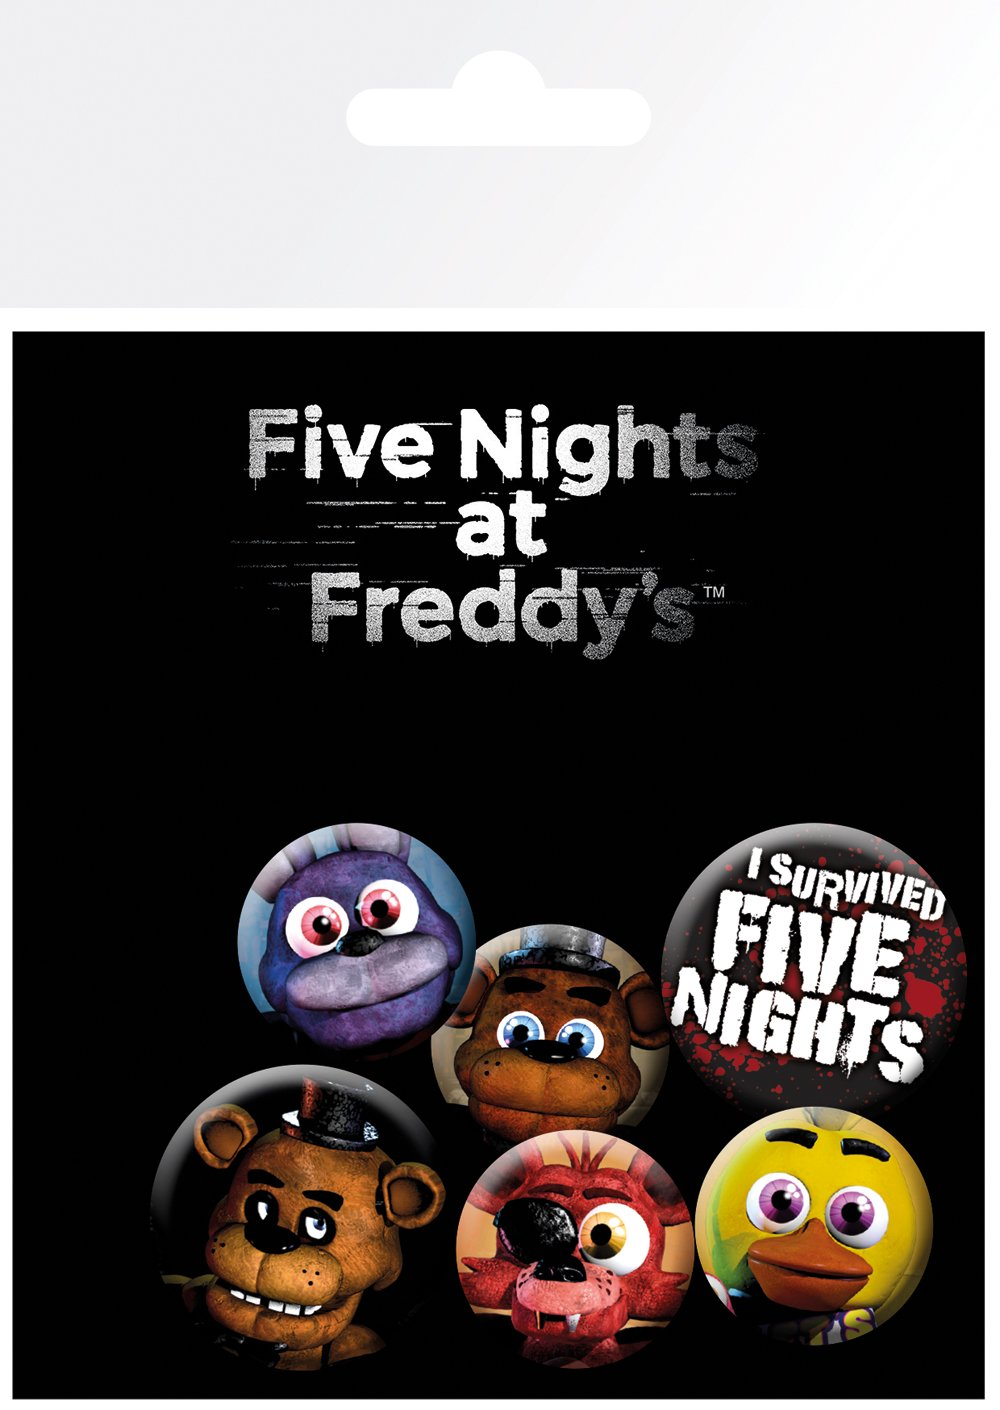 GB eye Five Nights at Freddys Mix Badge Pack, Aluminum, Multi-Colour, 14 x 0.3 x 10 cm